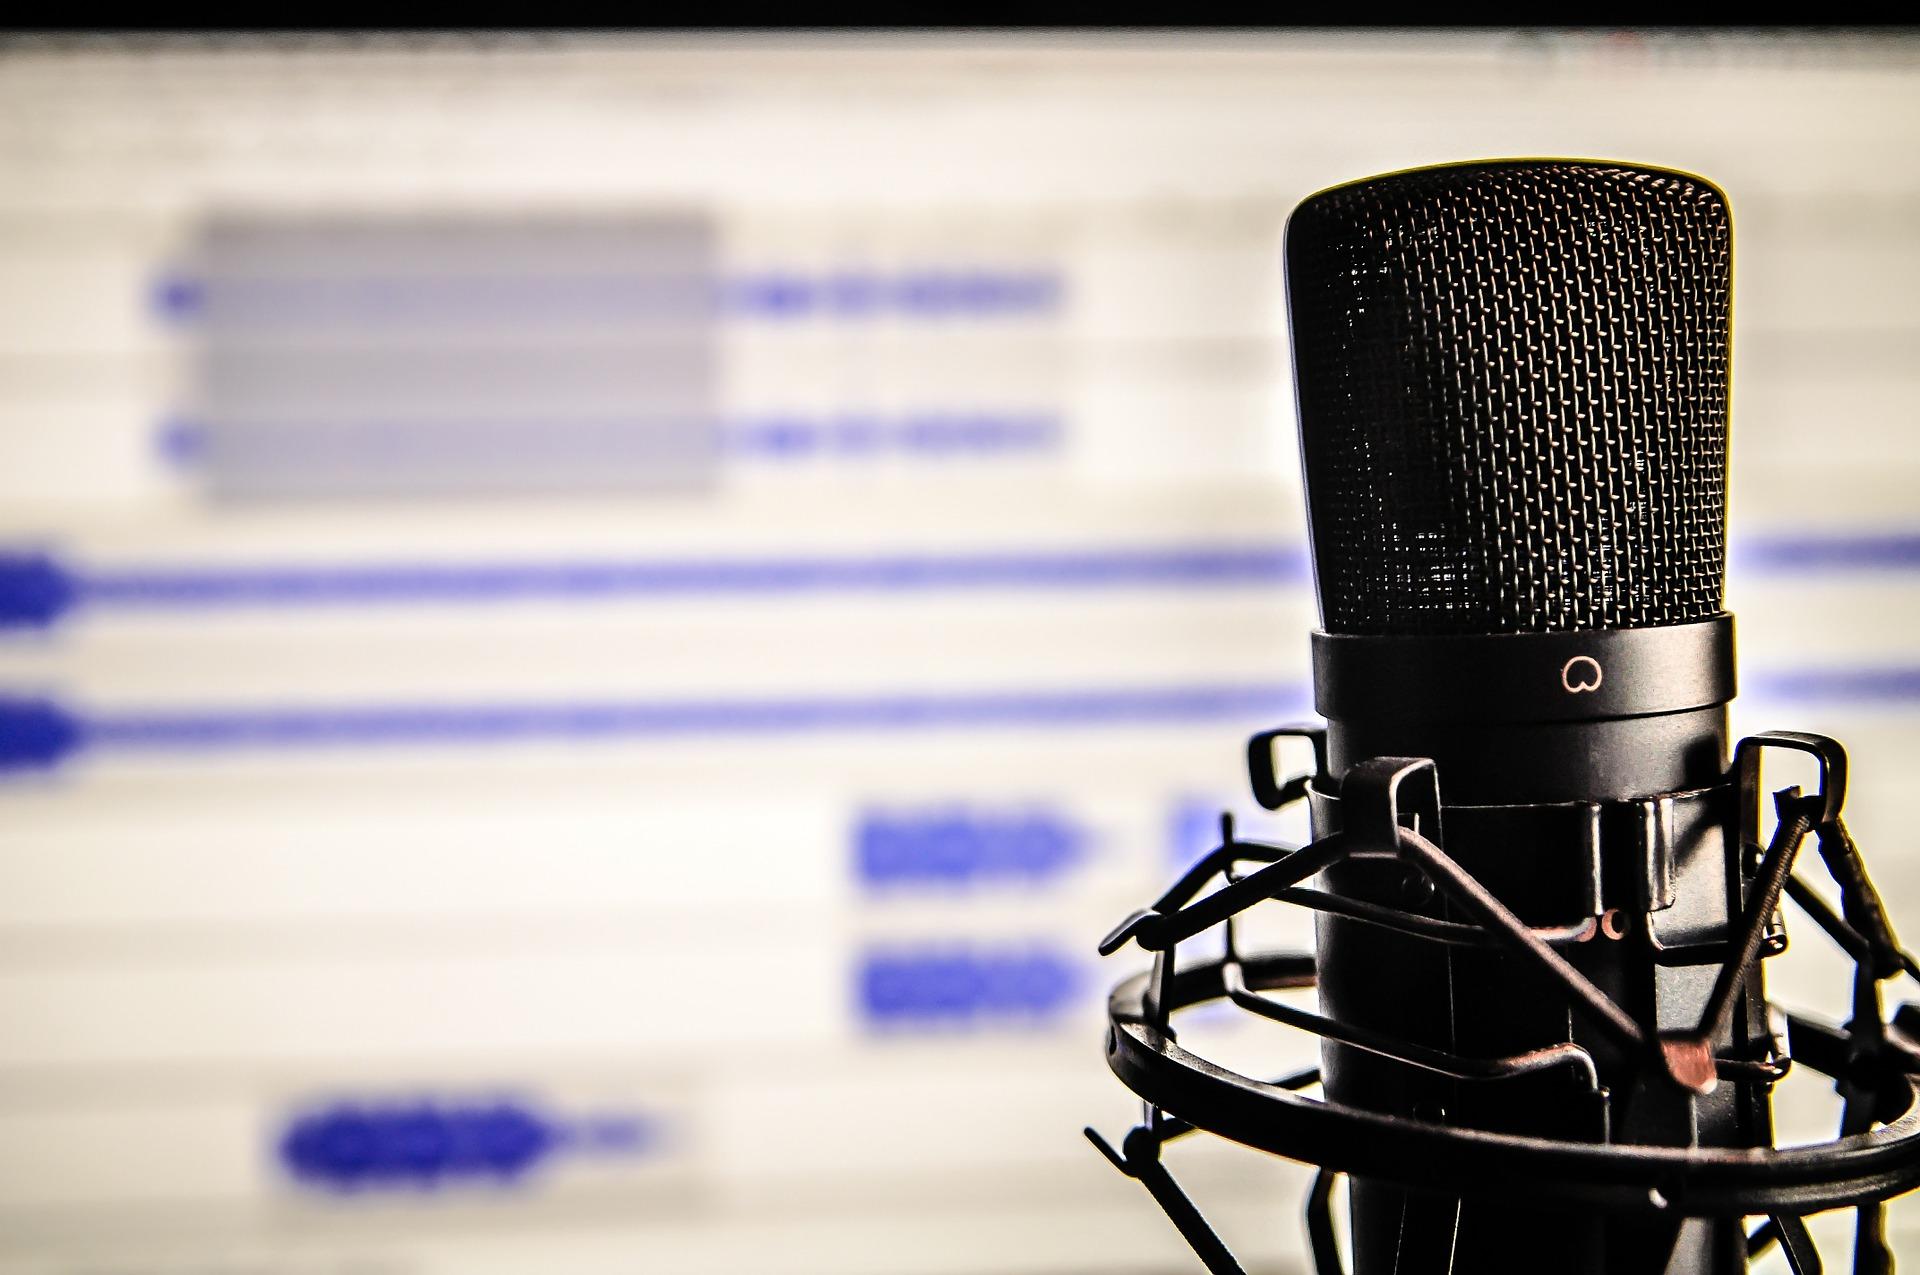 Podcast bat egiten